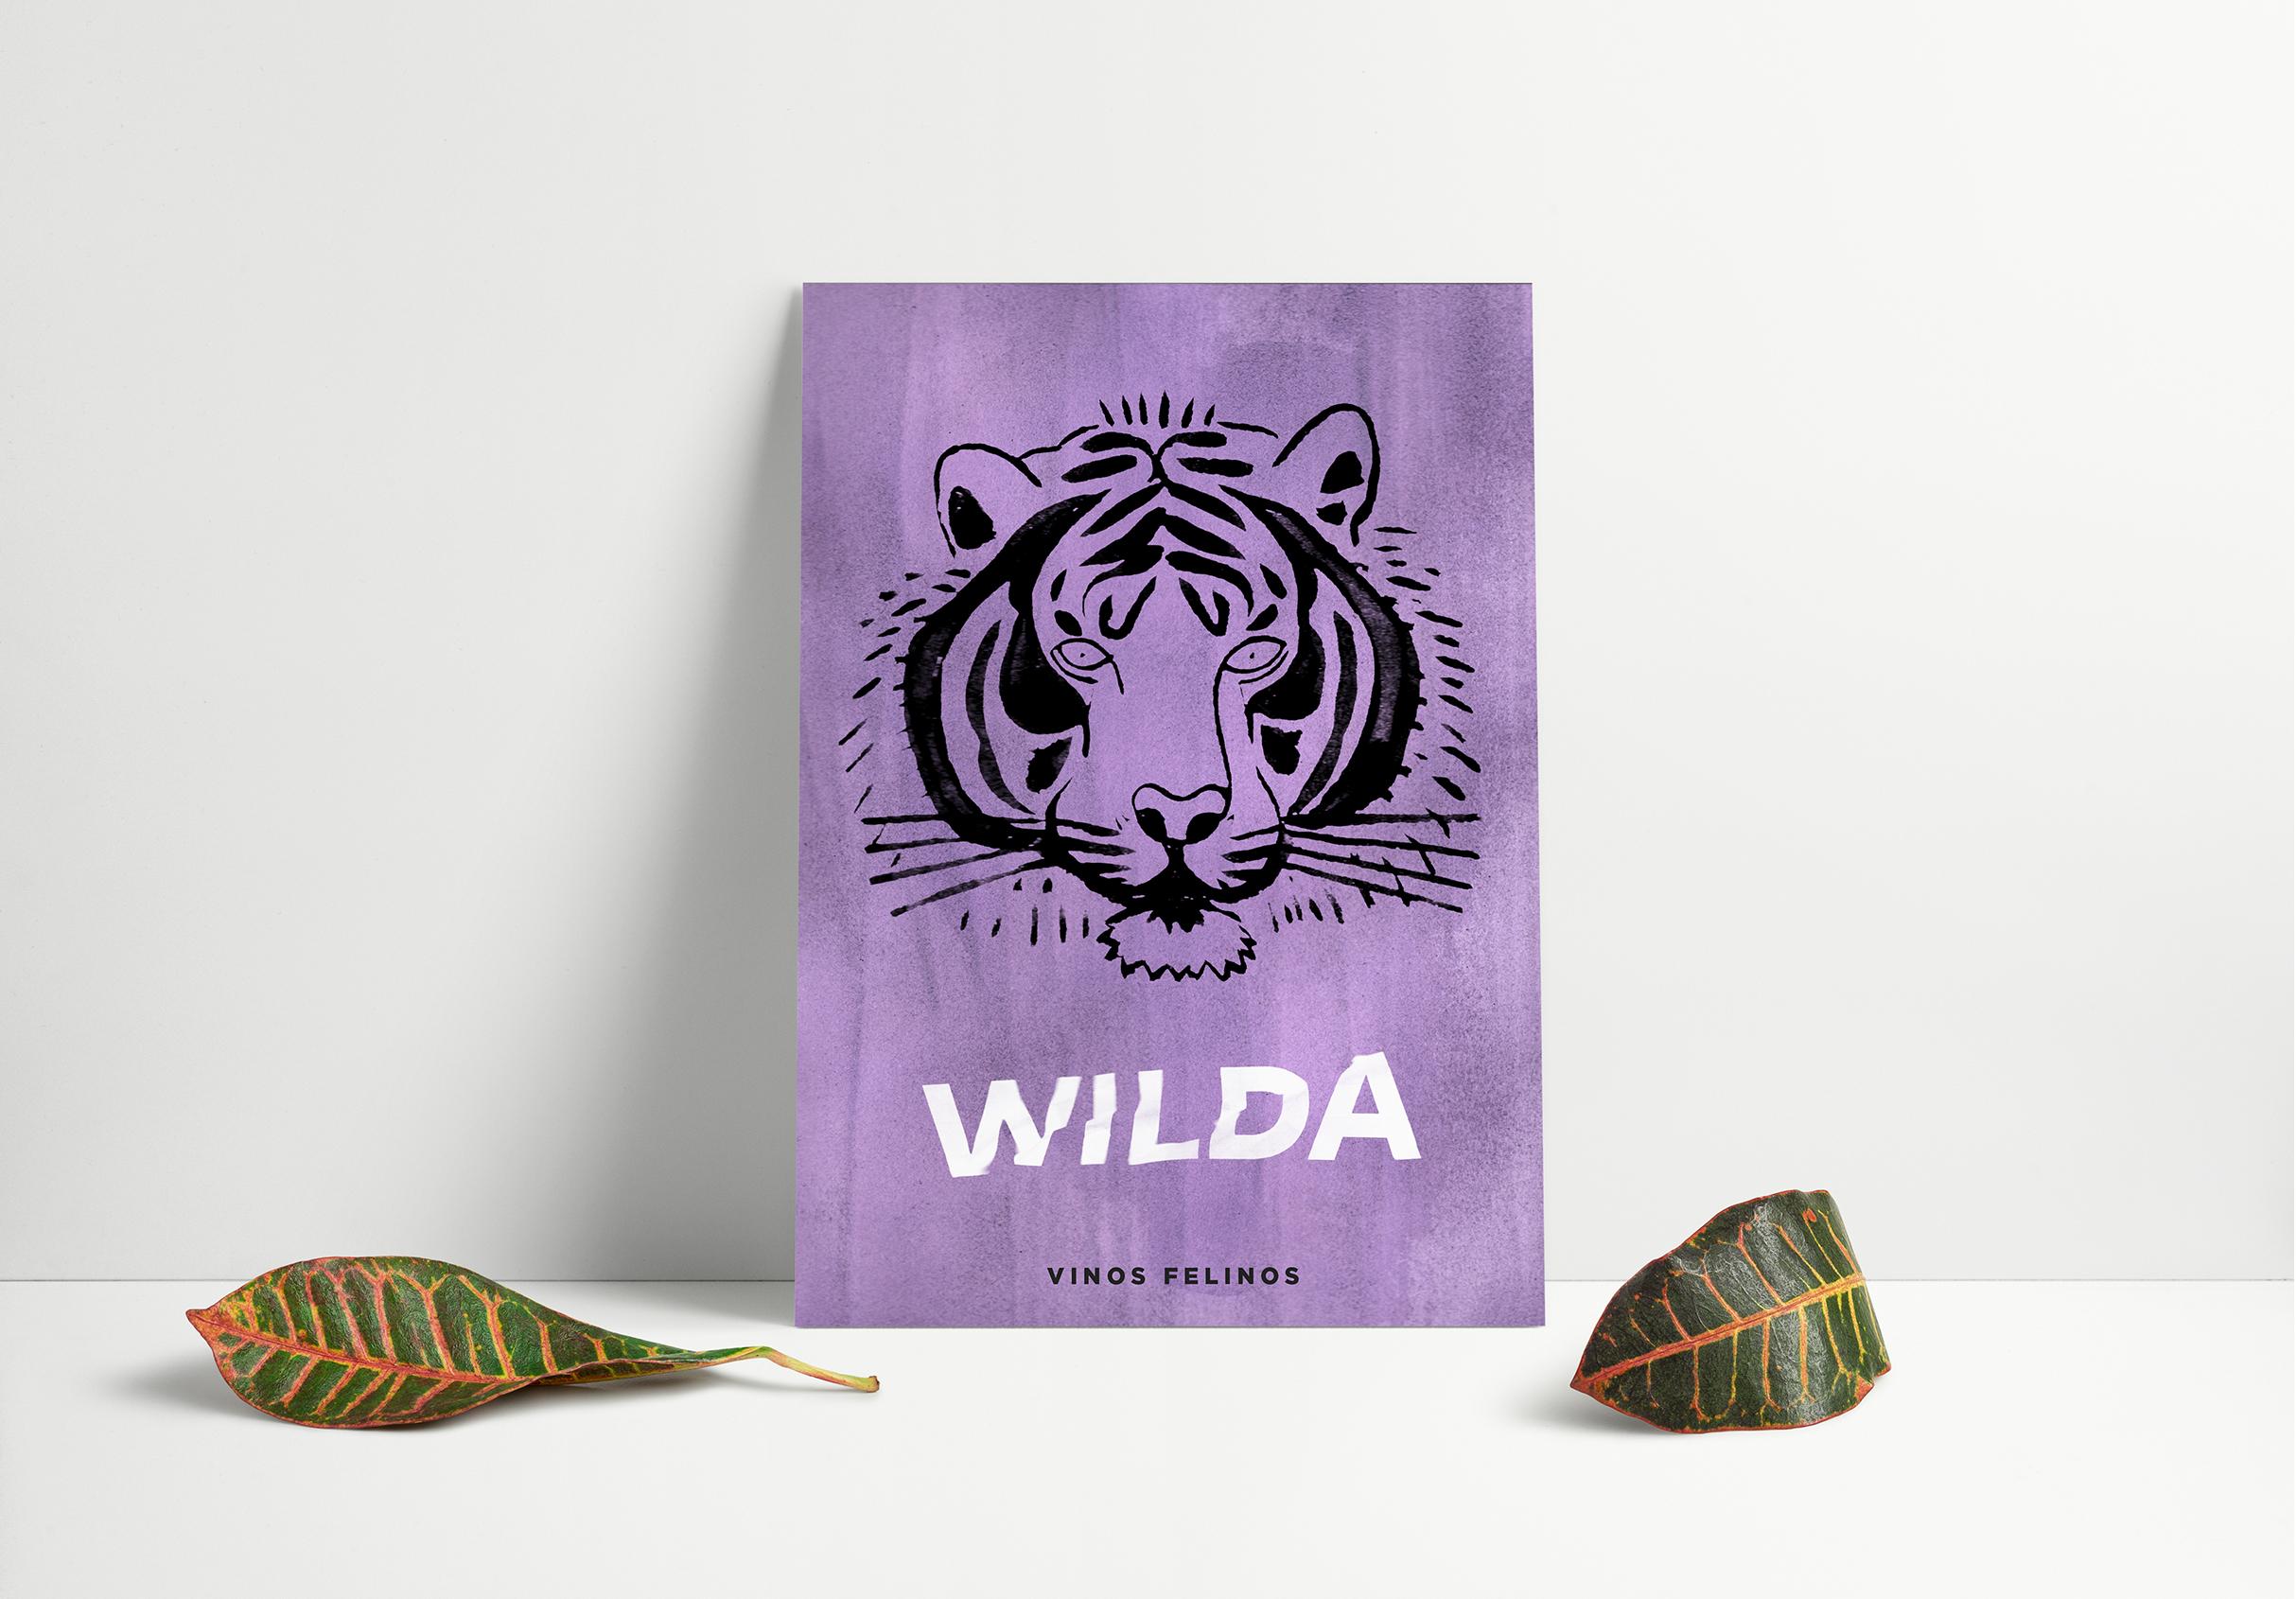 Wilda-ANGEL-ESPINOSA-06